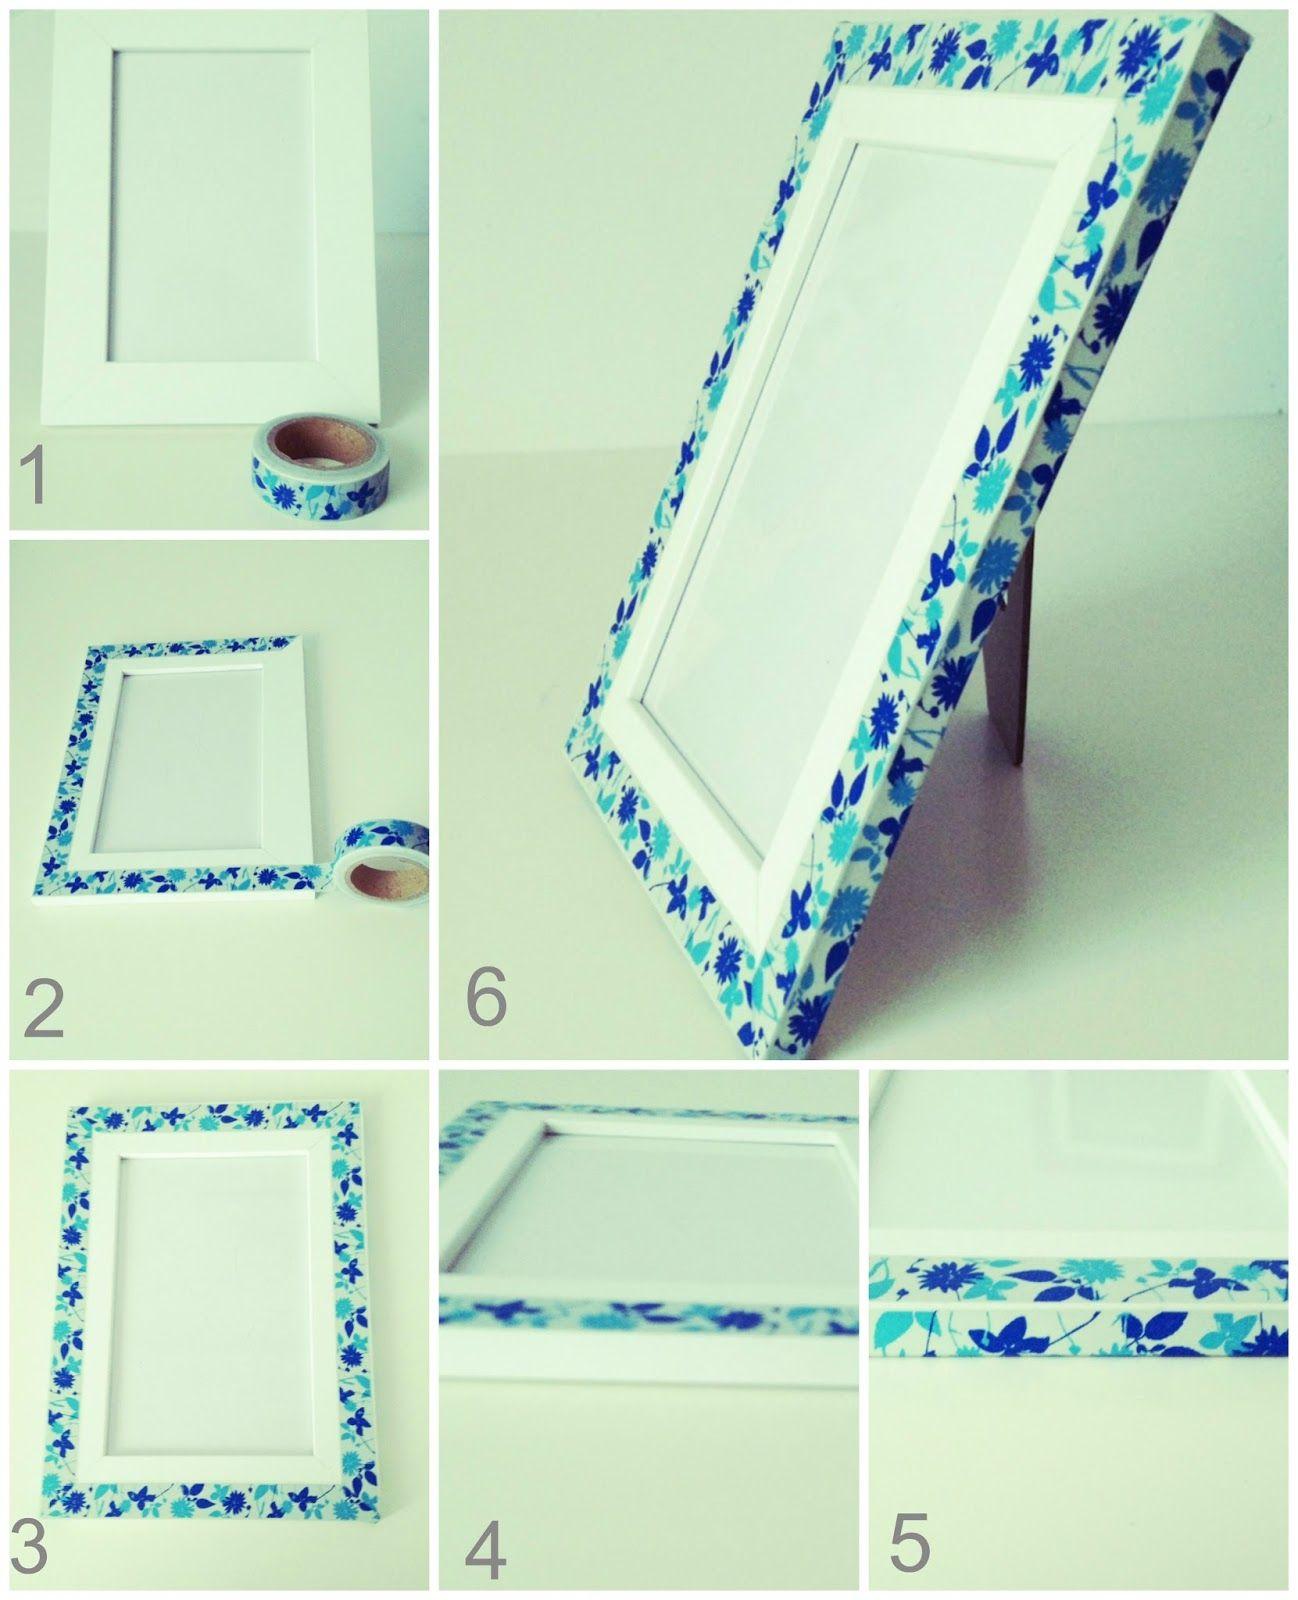 DIY: Decorar un marco con washi tape. http://1001tardes.blogspot.com.es/2014/05/diy-decorar-un-marco-con-washi-tape.html